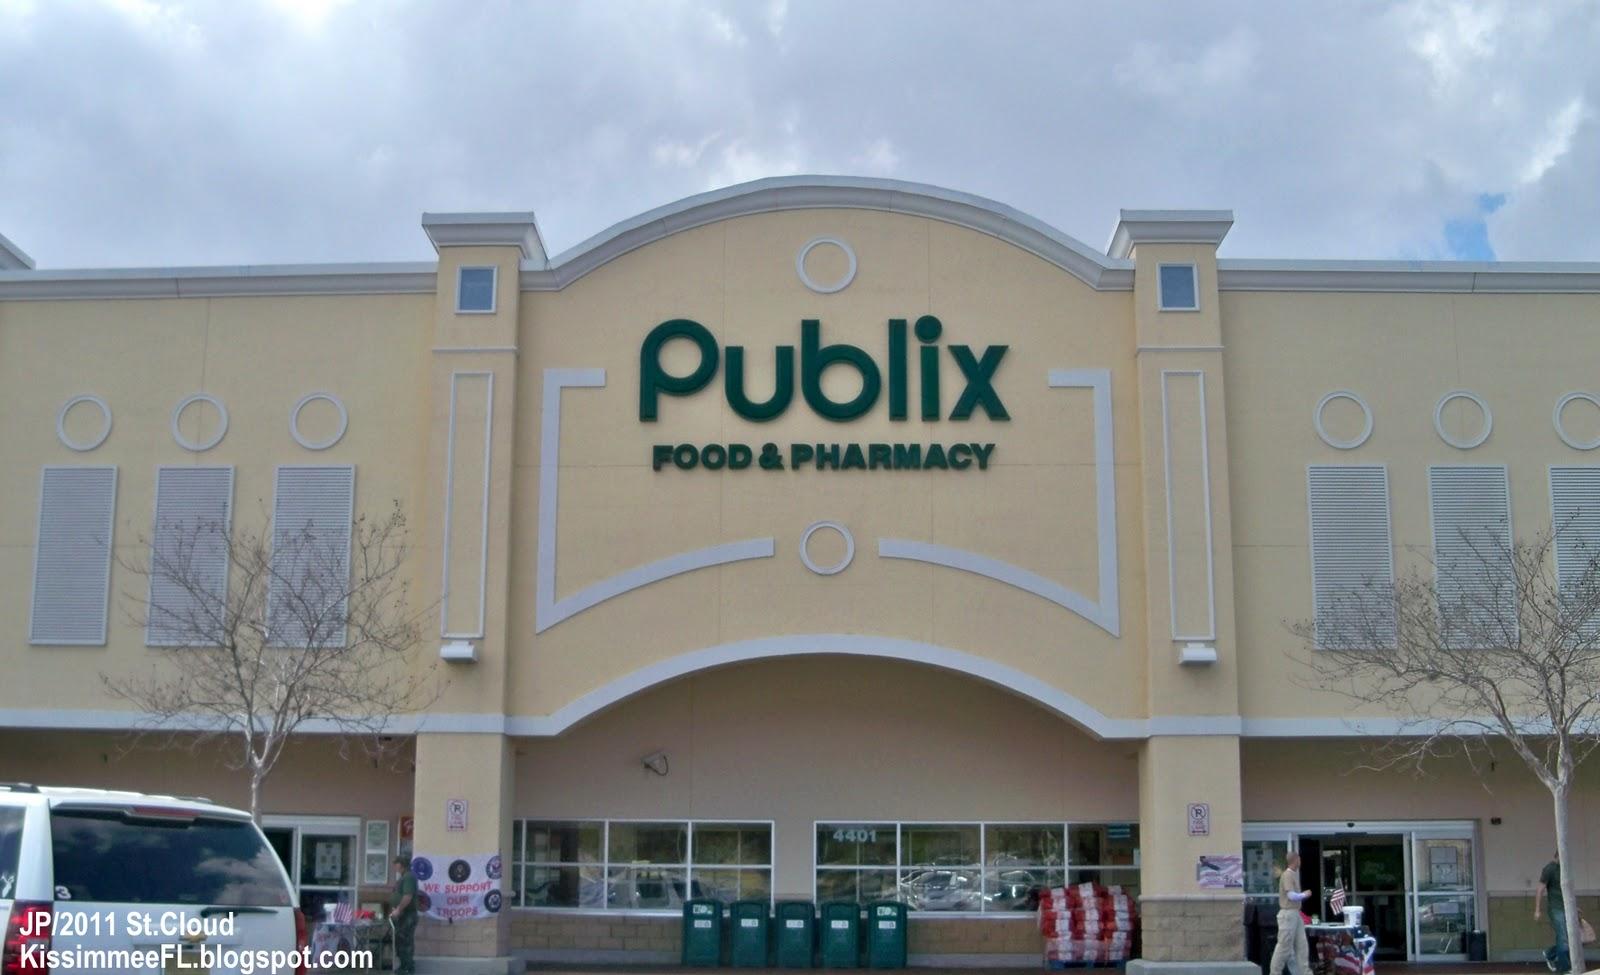 publix supermarket target market Publix super market evaluate how organizational functions (eg, marketing, finance, human resources, operations, etc) impact the organizational structure of publix super.